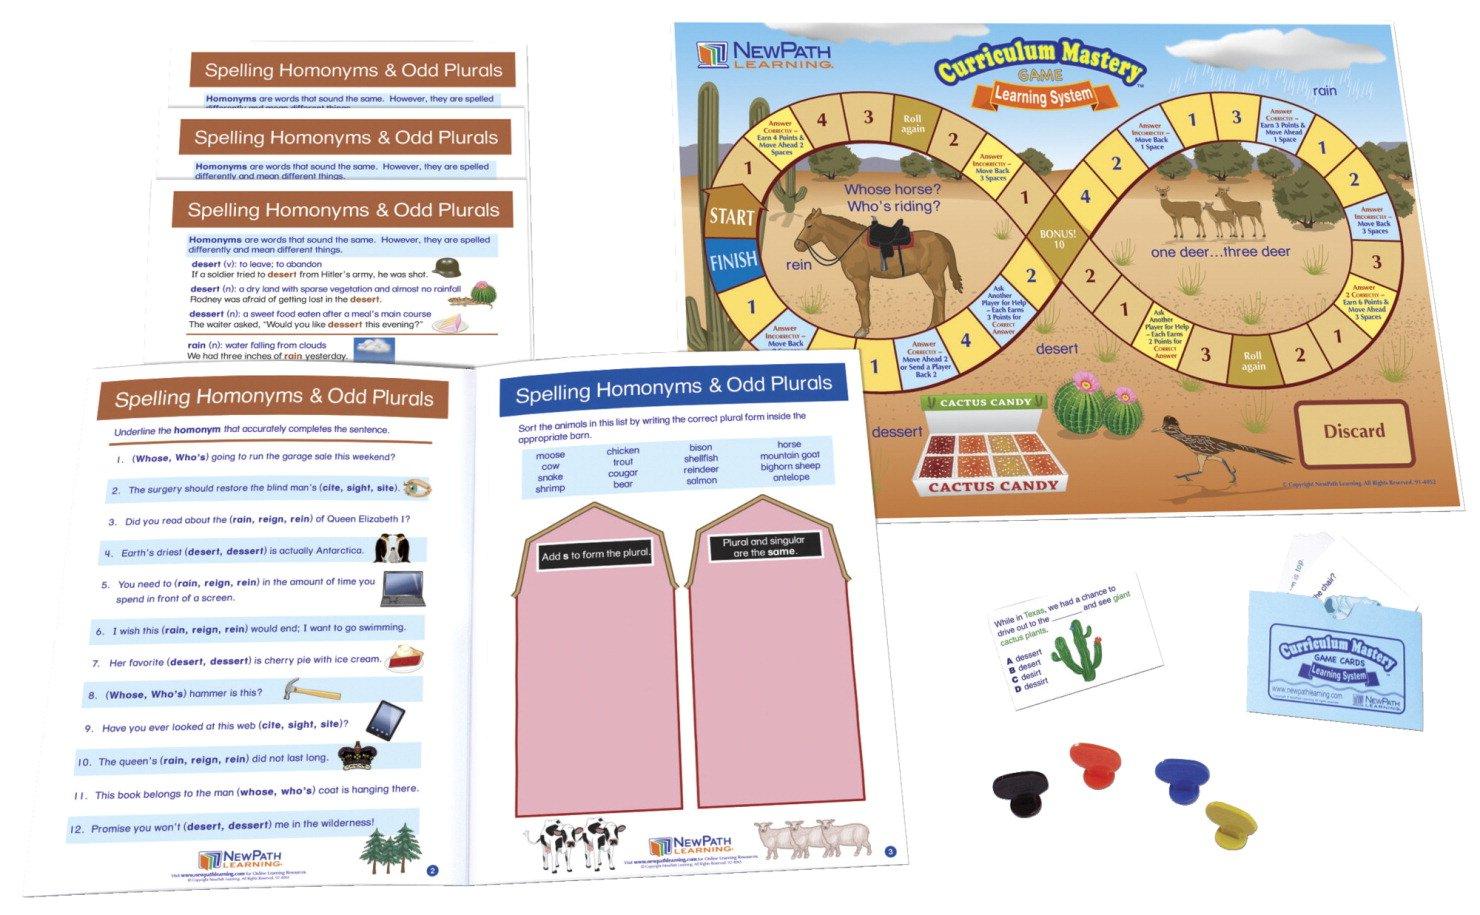 Spelling Common Homonyms Learning Center Game Grades 6-9